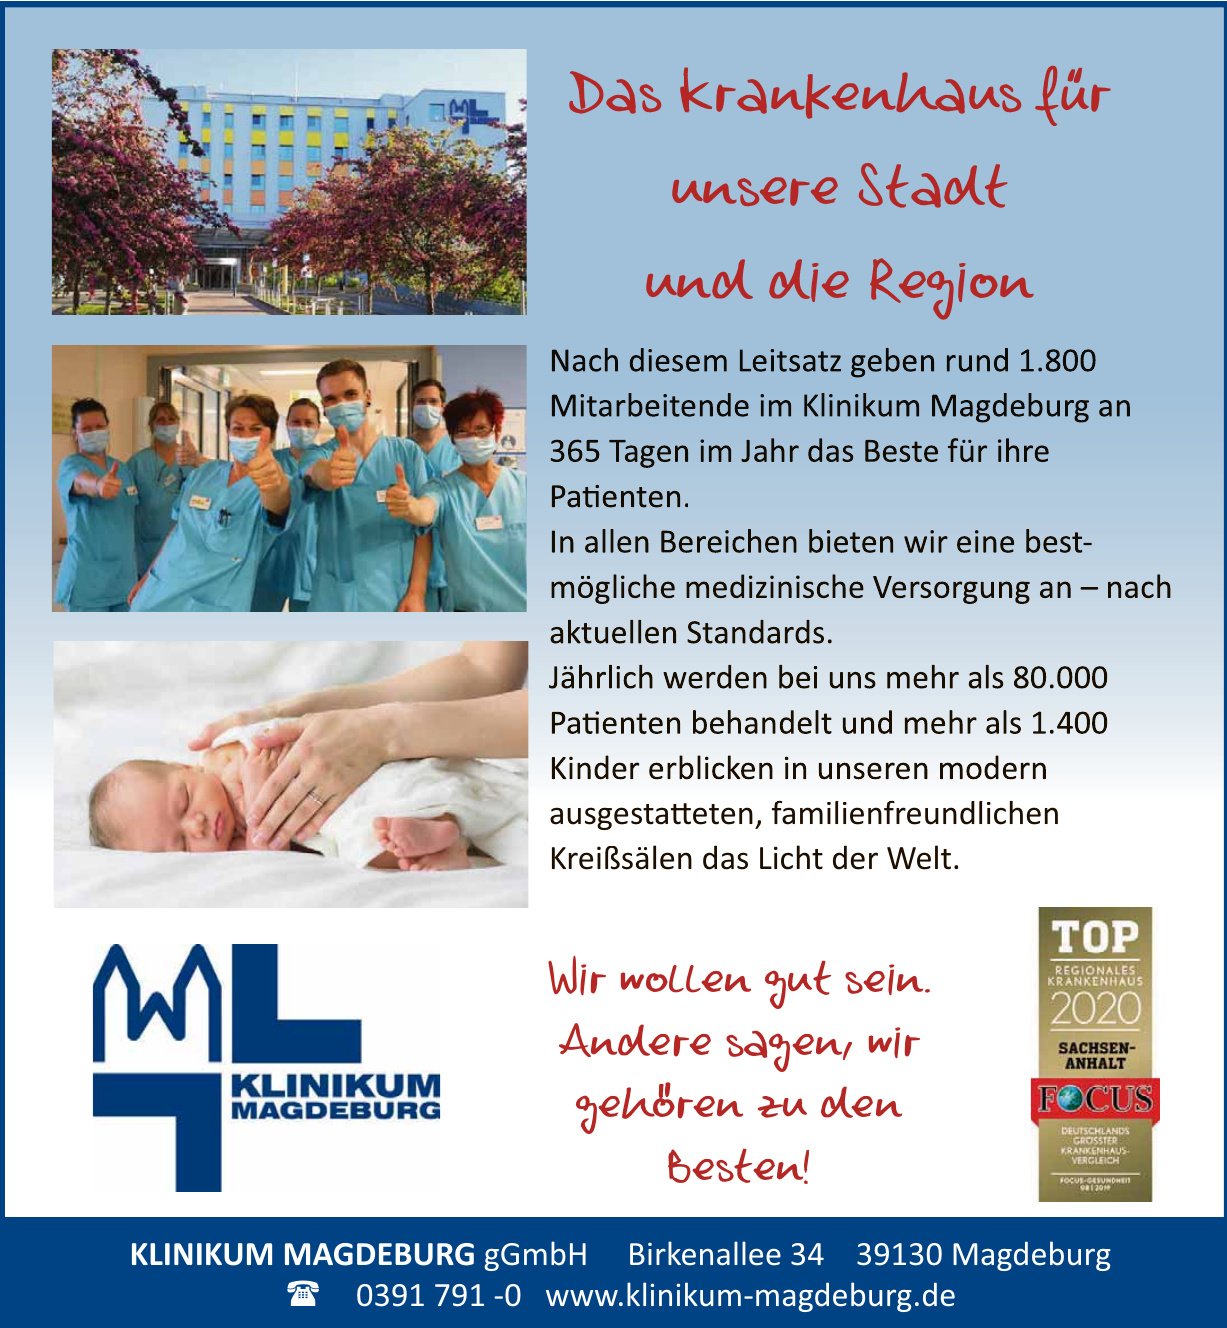 Klinikum Magdeburg gGmbH